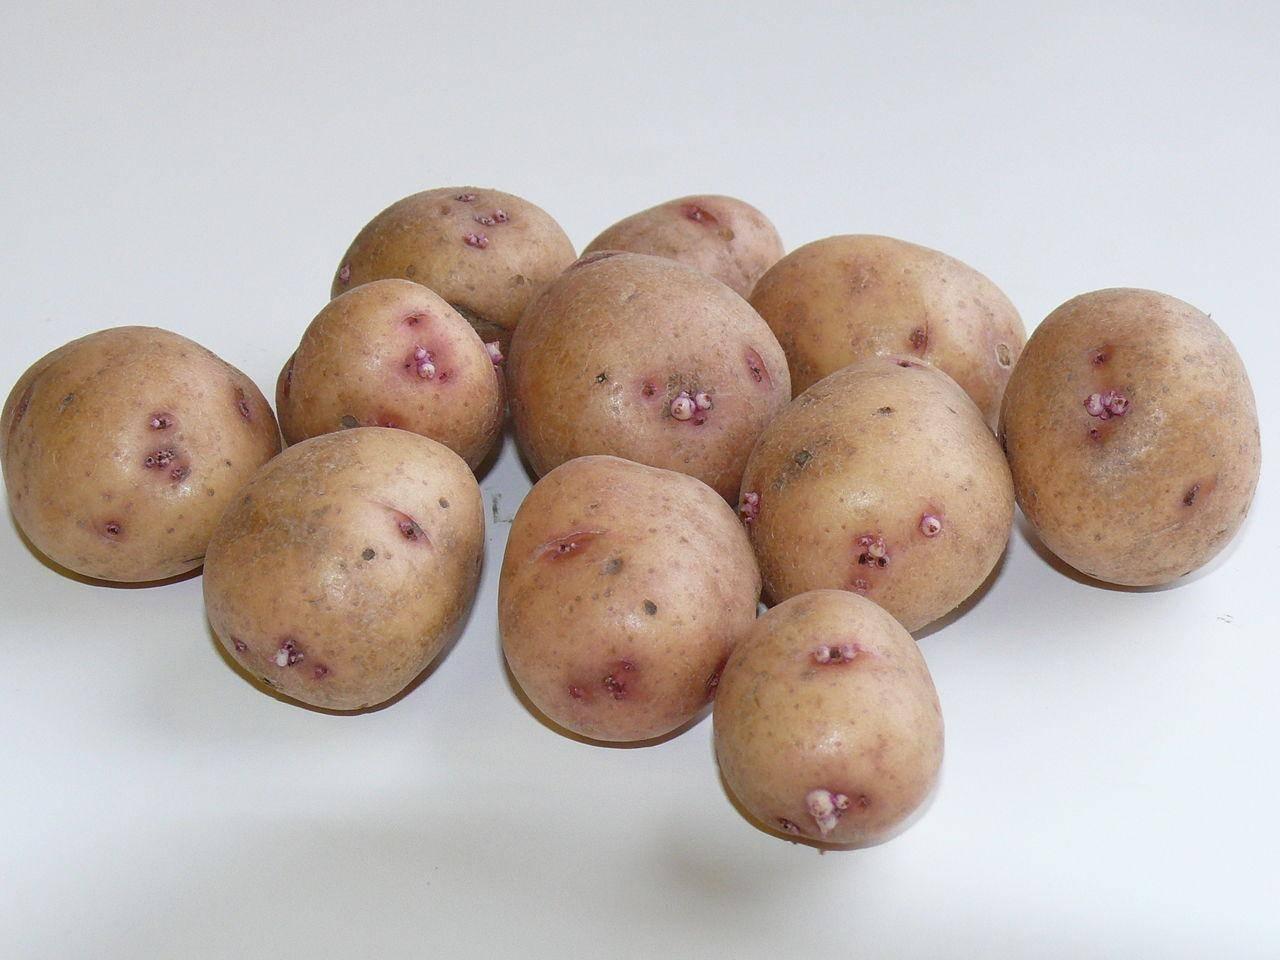 Сорт картофеля «уладар» – описание и фото